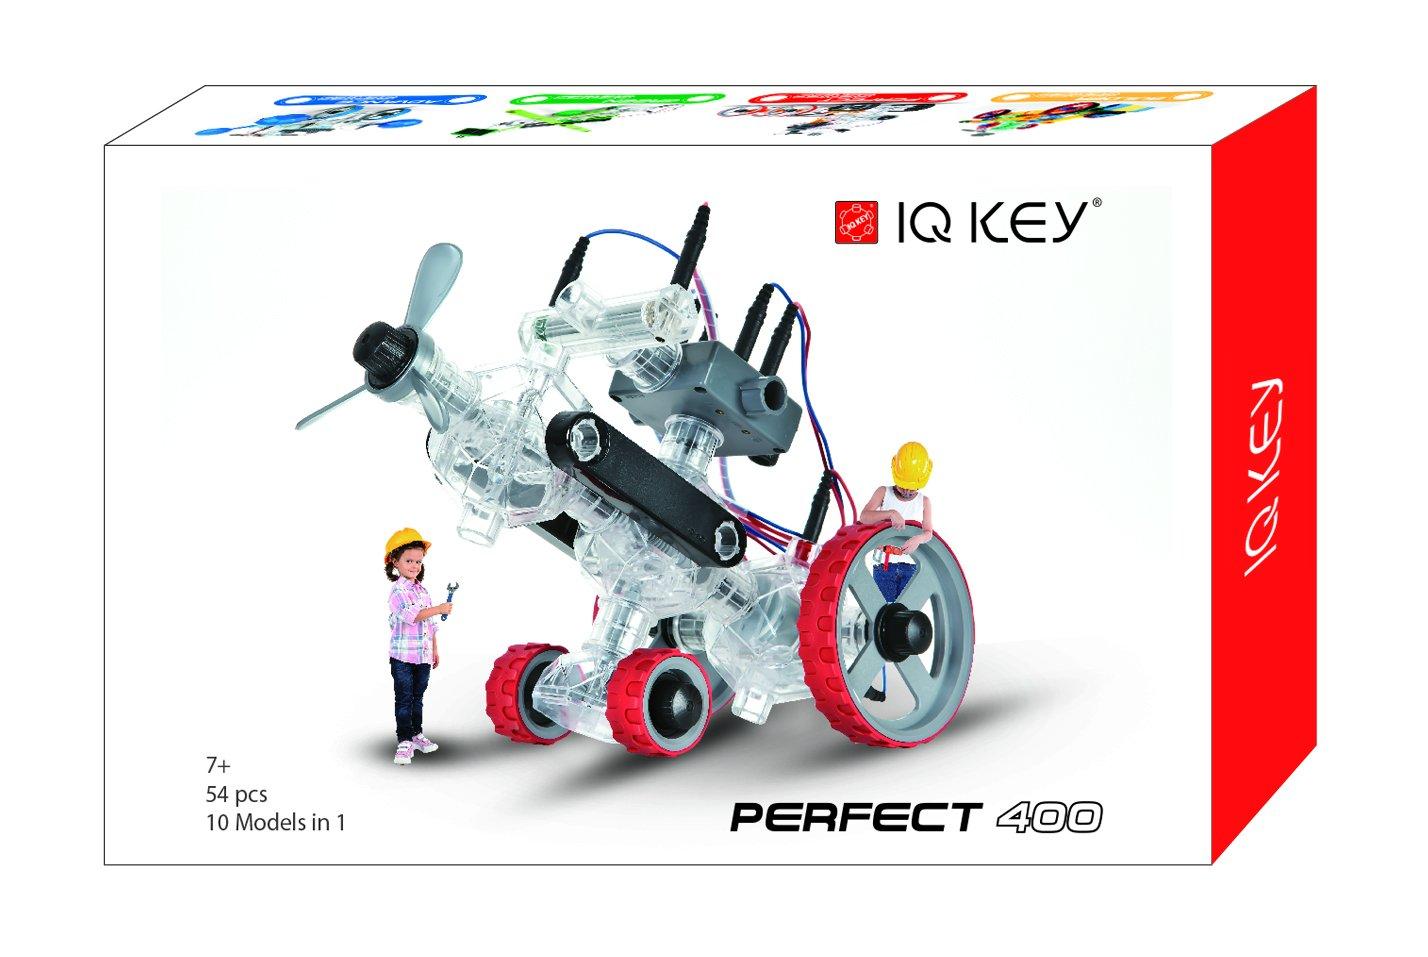 IQ KEY KEY KEY Perfect 400 Educational Assembly Toy Kits by IQ KEY dea349